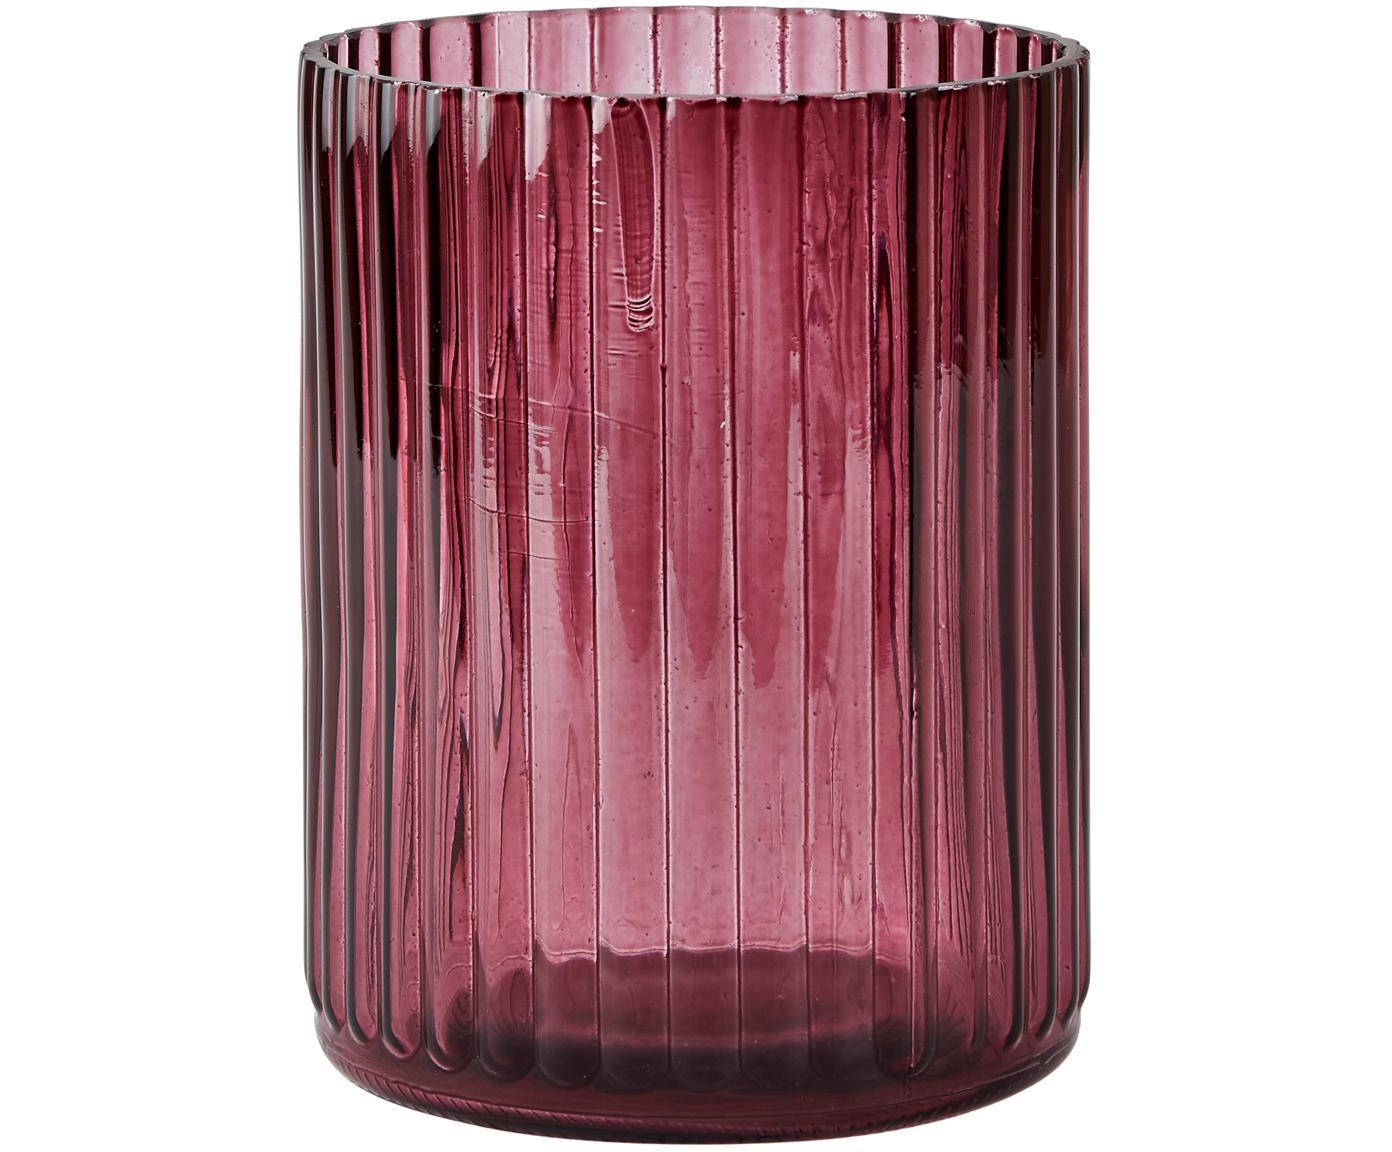 Vaso in vetro Rubio, Vetro, Bordeaux, trasparente, Ø 11 x Alt. 15 cm